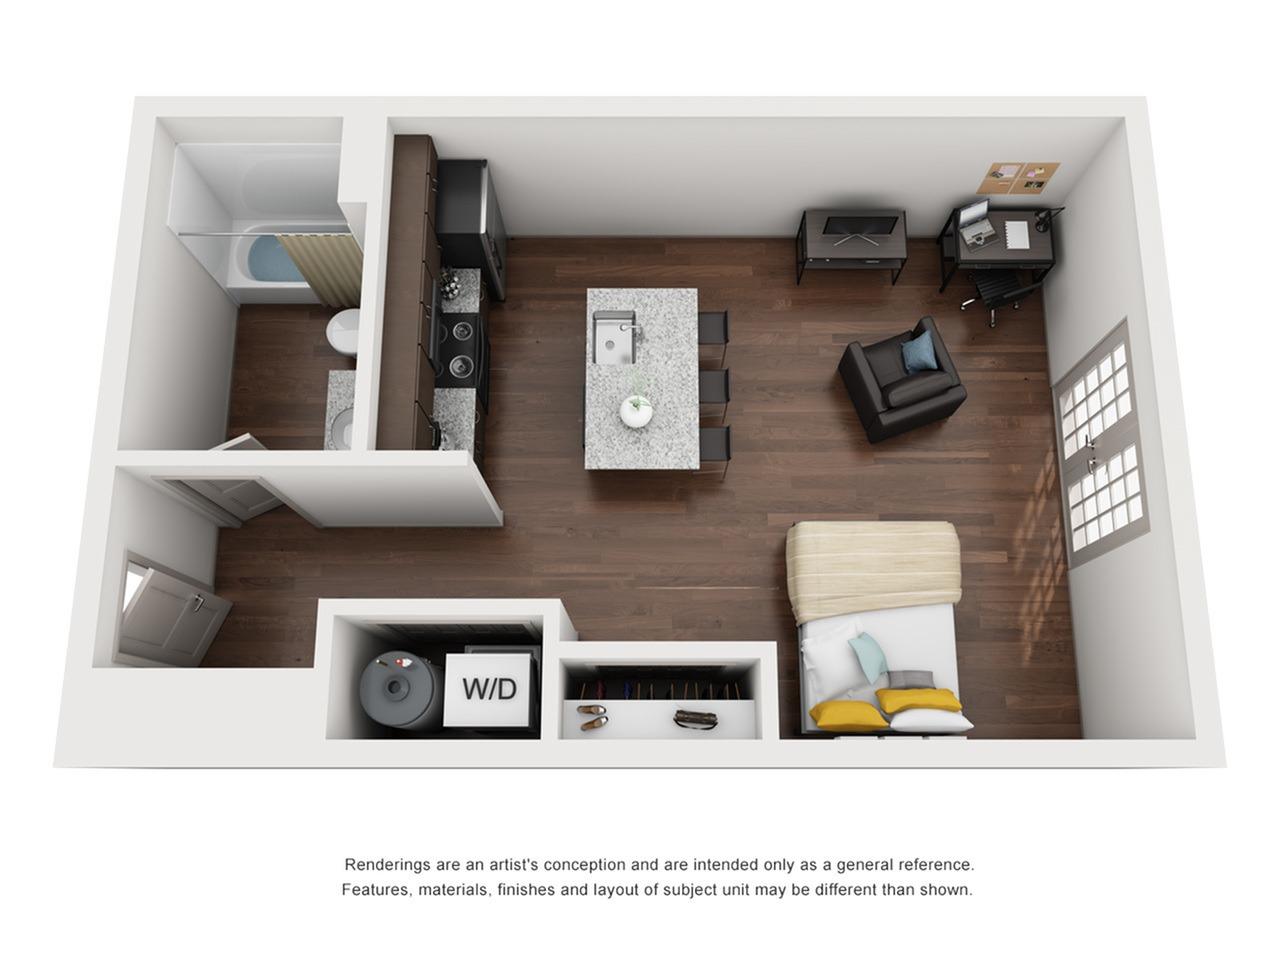 studio apartments tallahassee